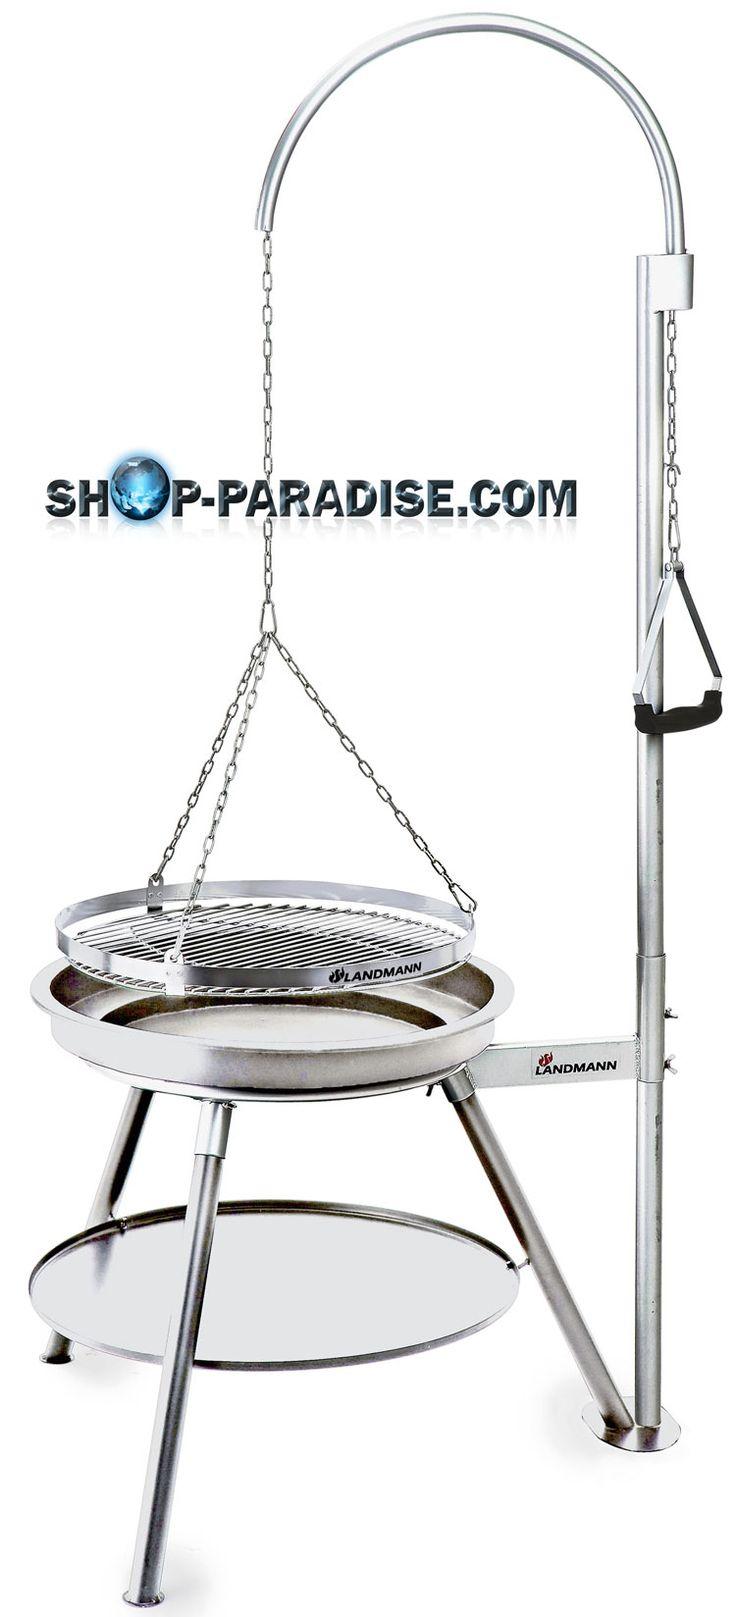 SHOP-PARADISE.COM:  Holzkohlegrill Inox Edelstahl, Schwenkgrill Geos 249,99 €